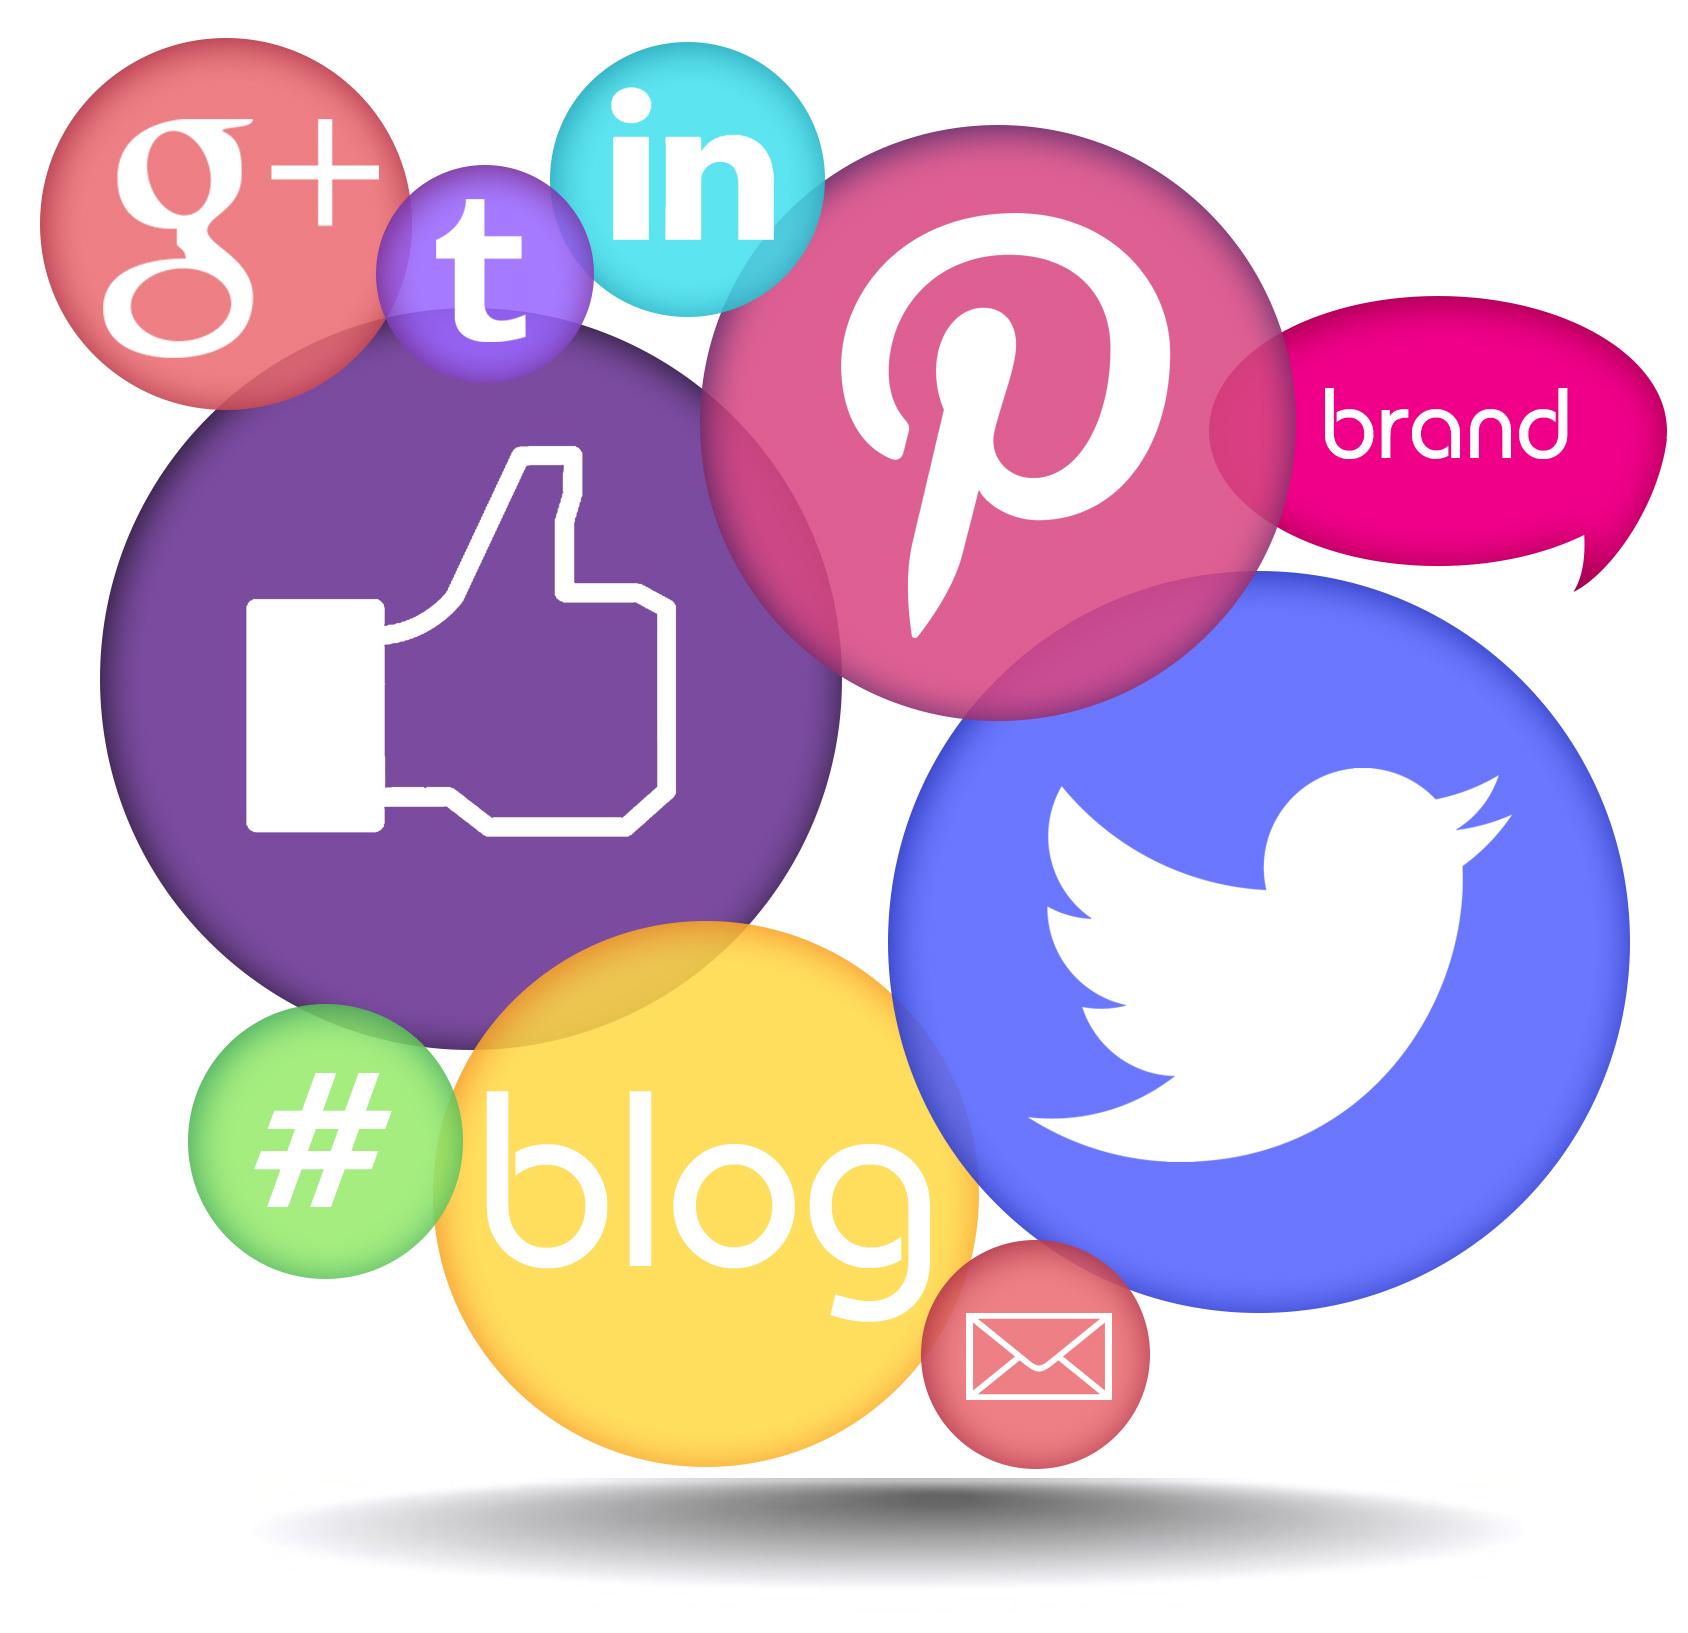 Free social media icon image